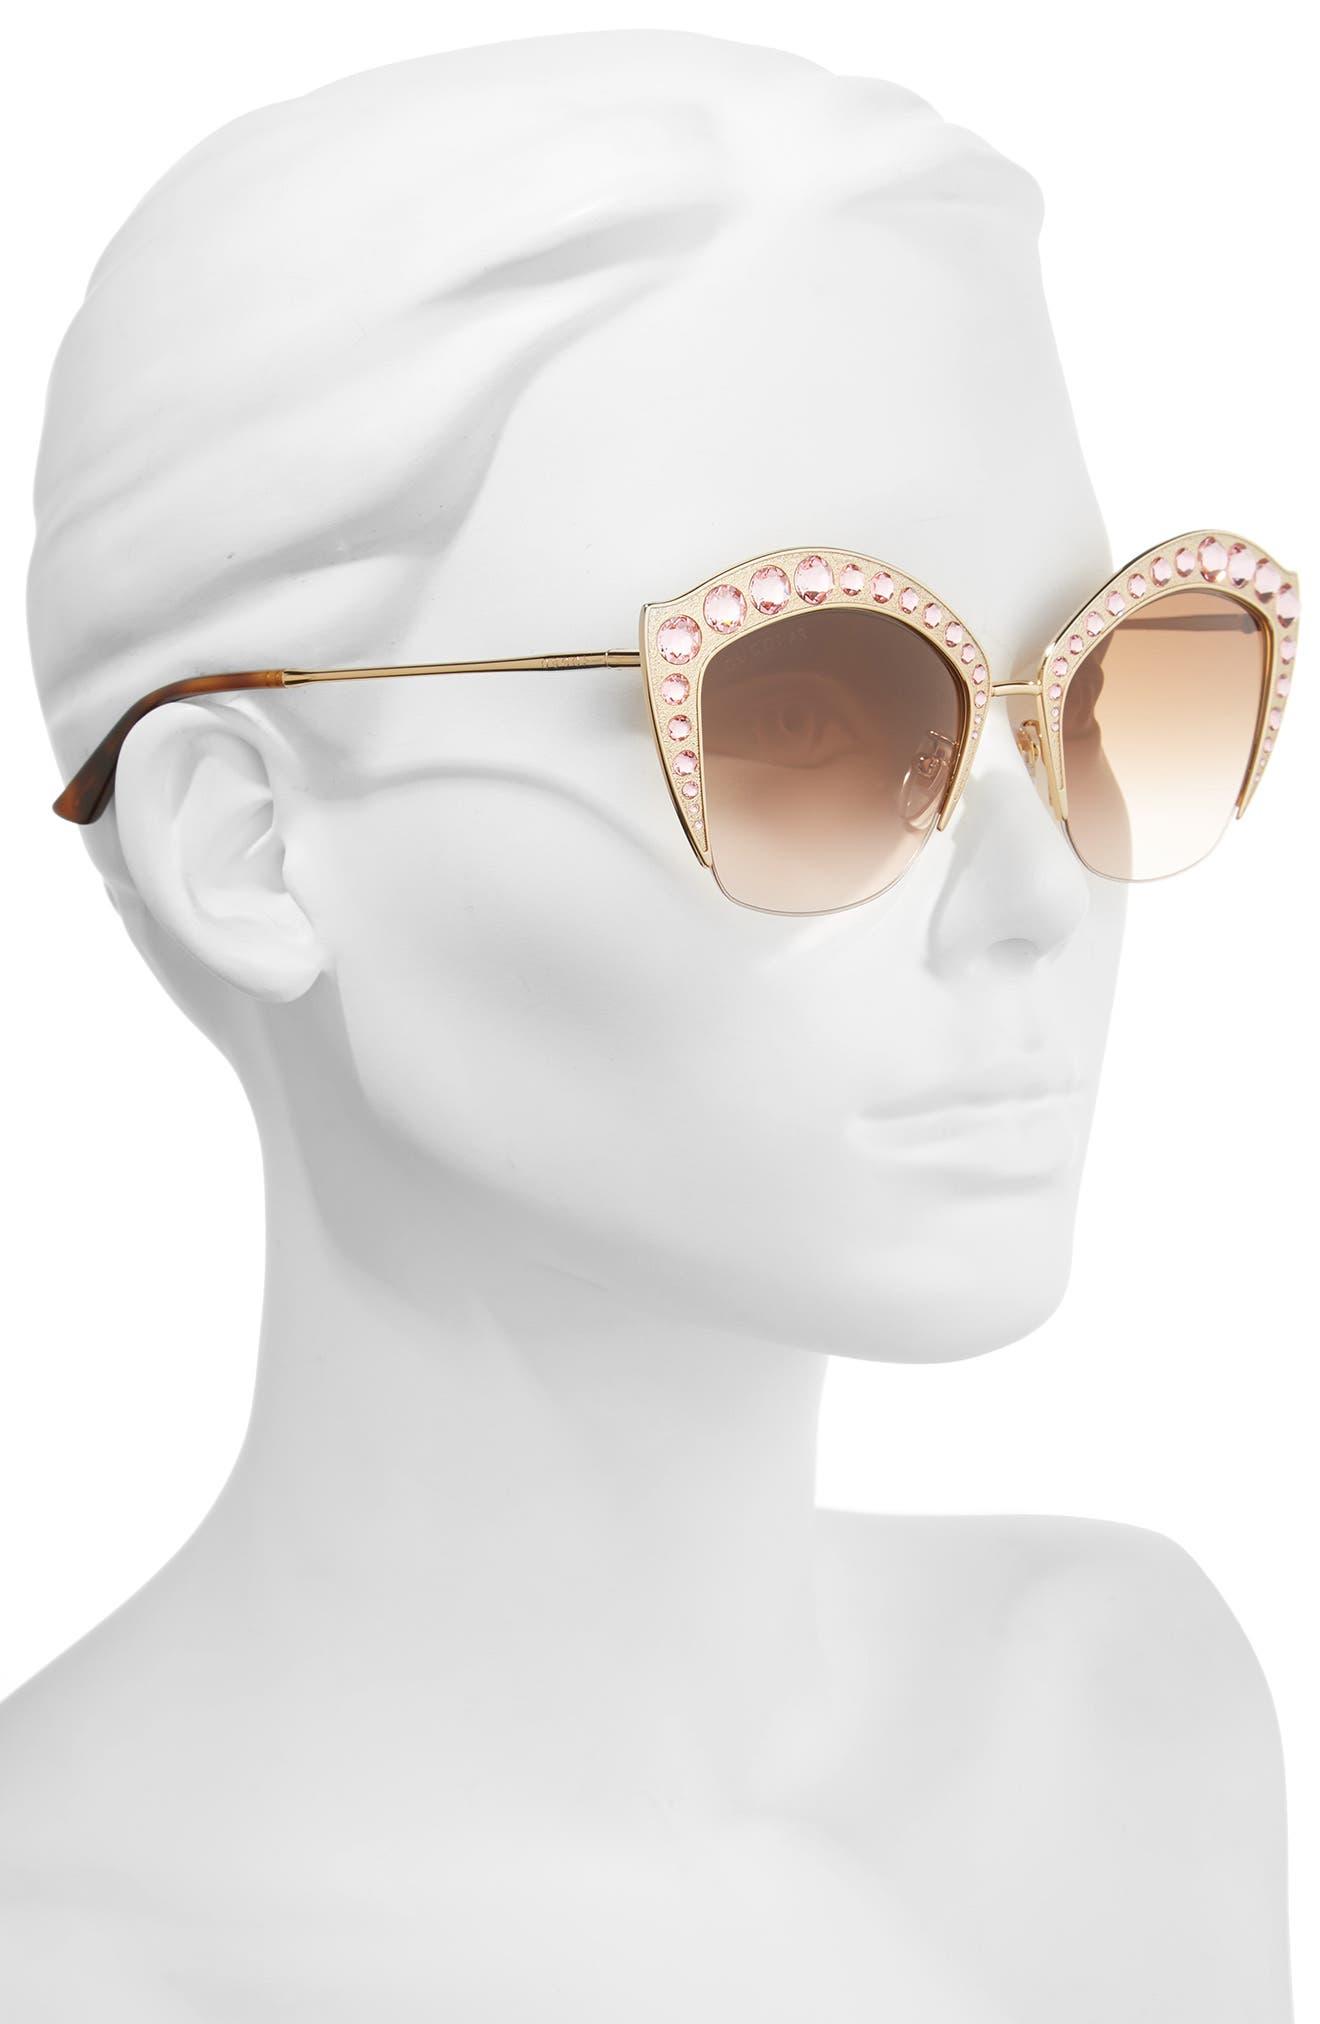 53mm Embellished Cat Eye Sunglasses,                             Alternate thumbnail 2, color,                             710